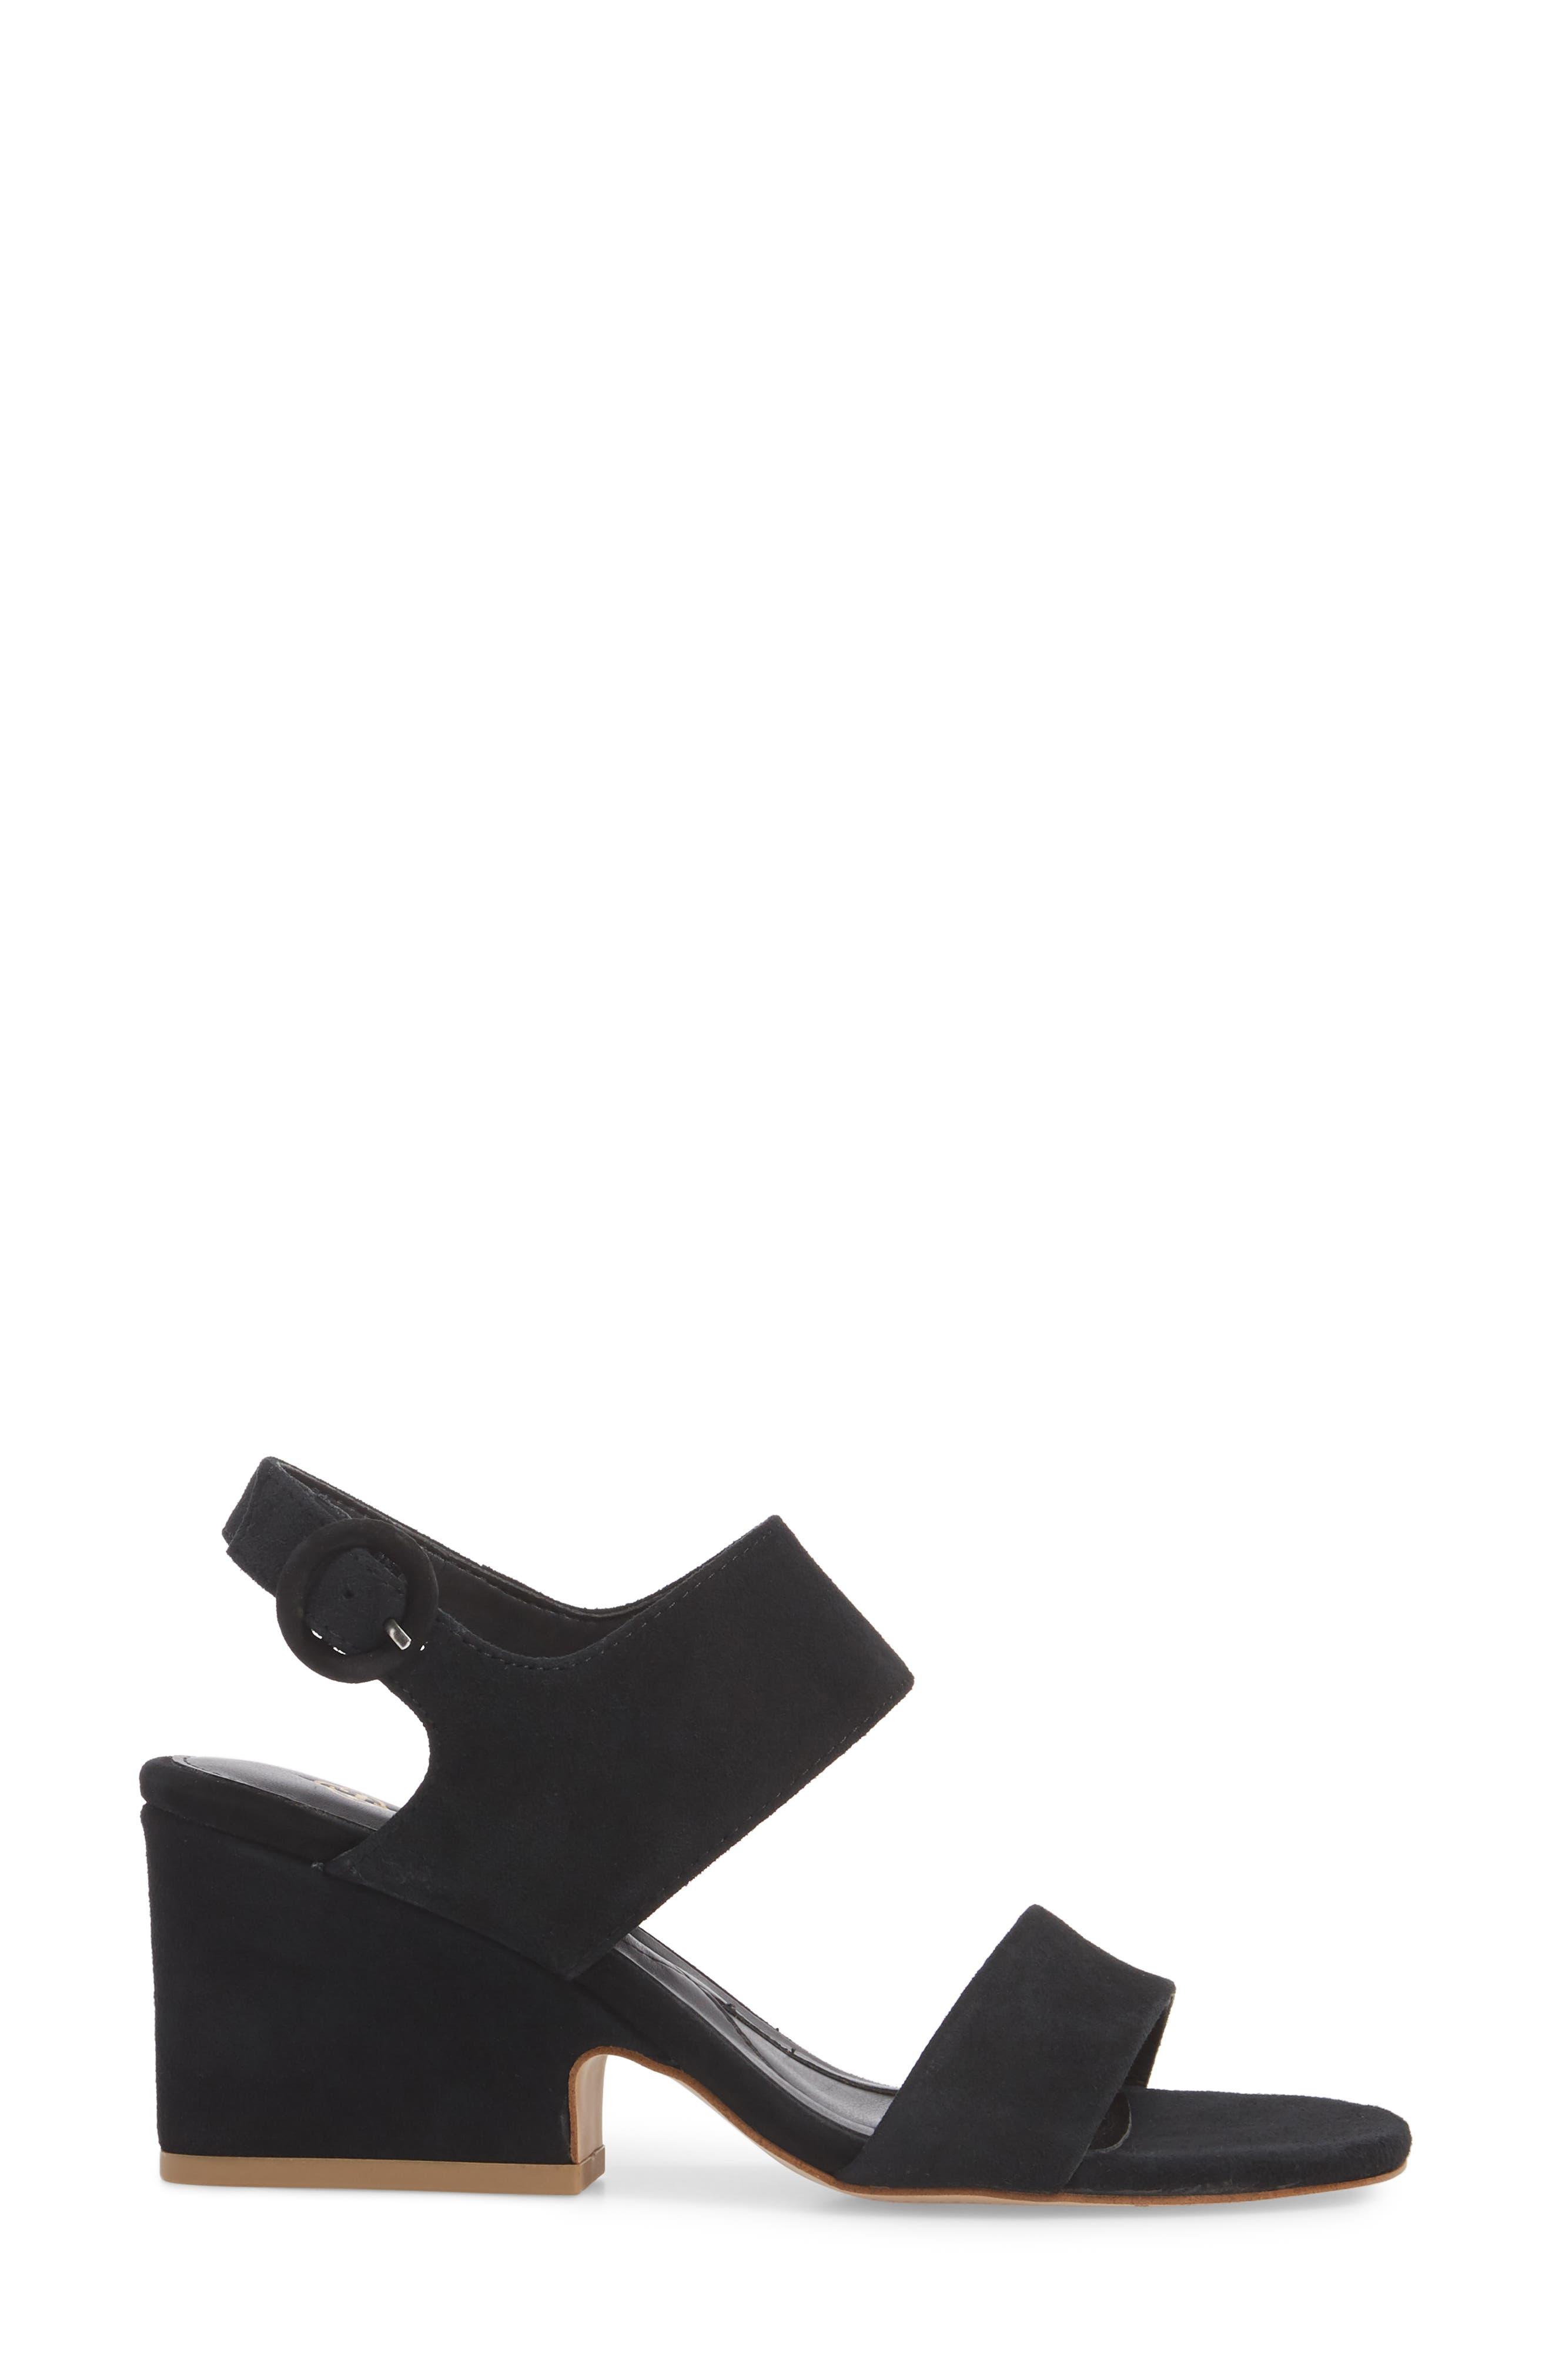 ISOLÁ, Isola Landra Block Heel Sandal, Alternate thumbnail 3, color, BLACK SUEDE